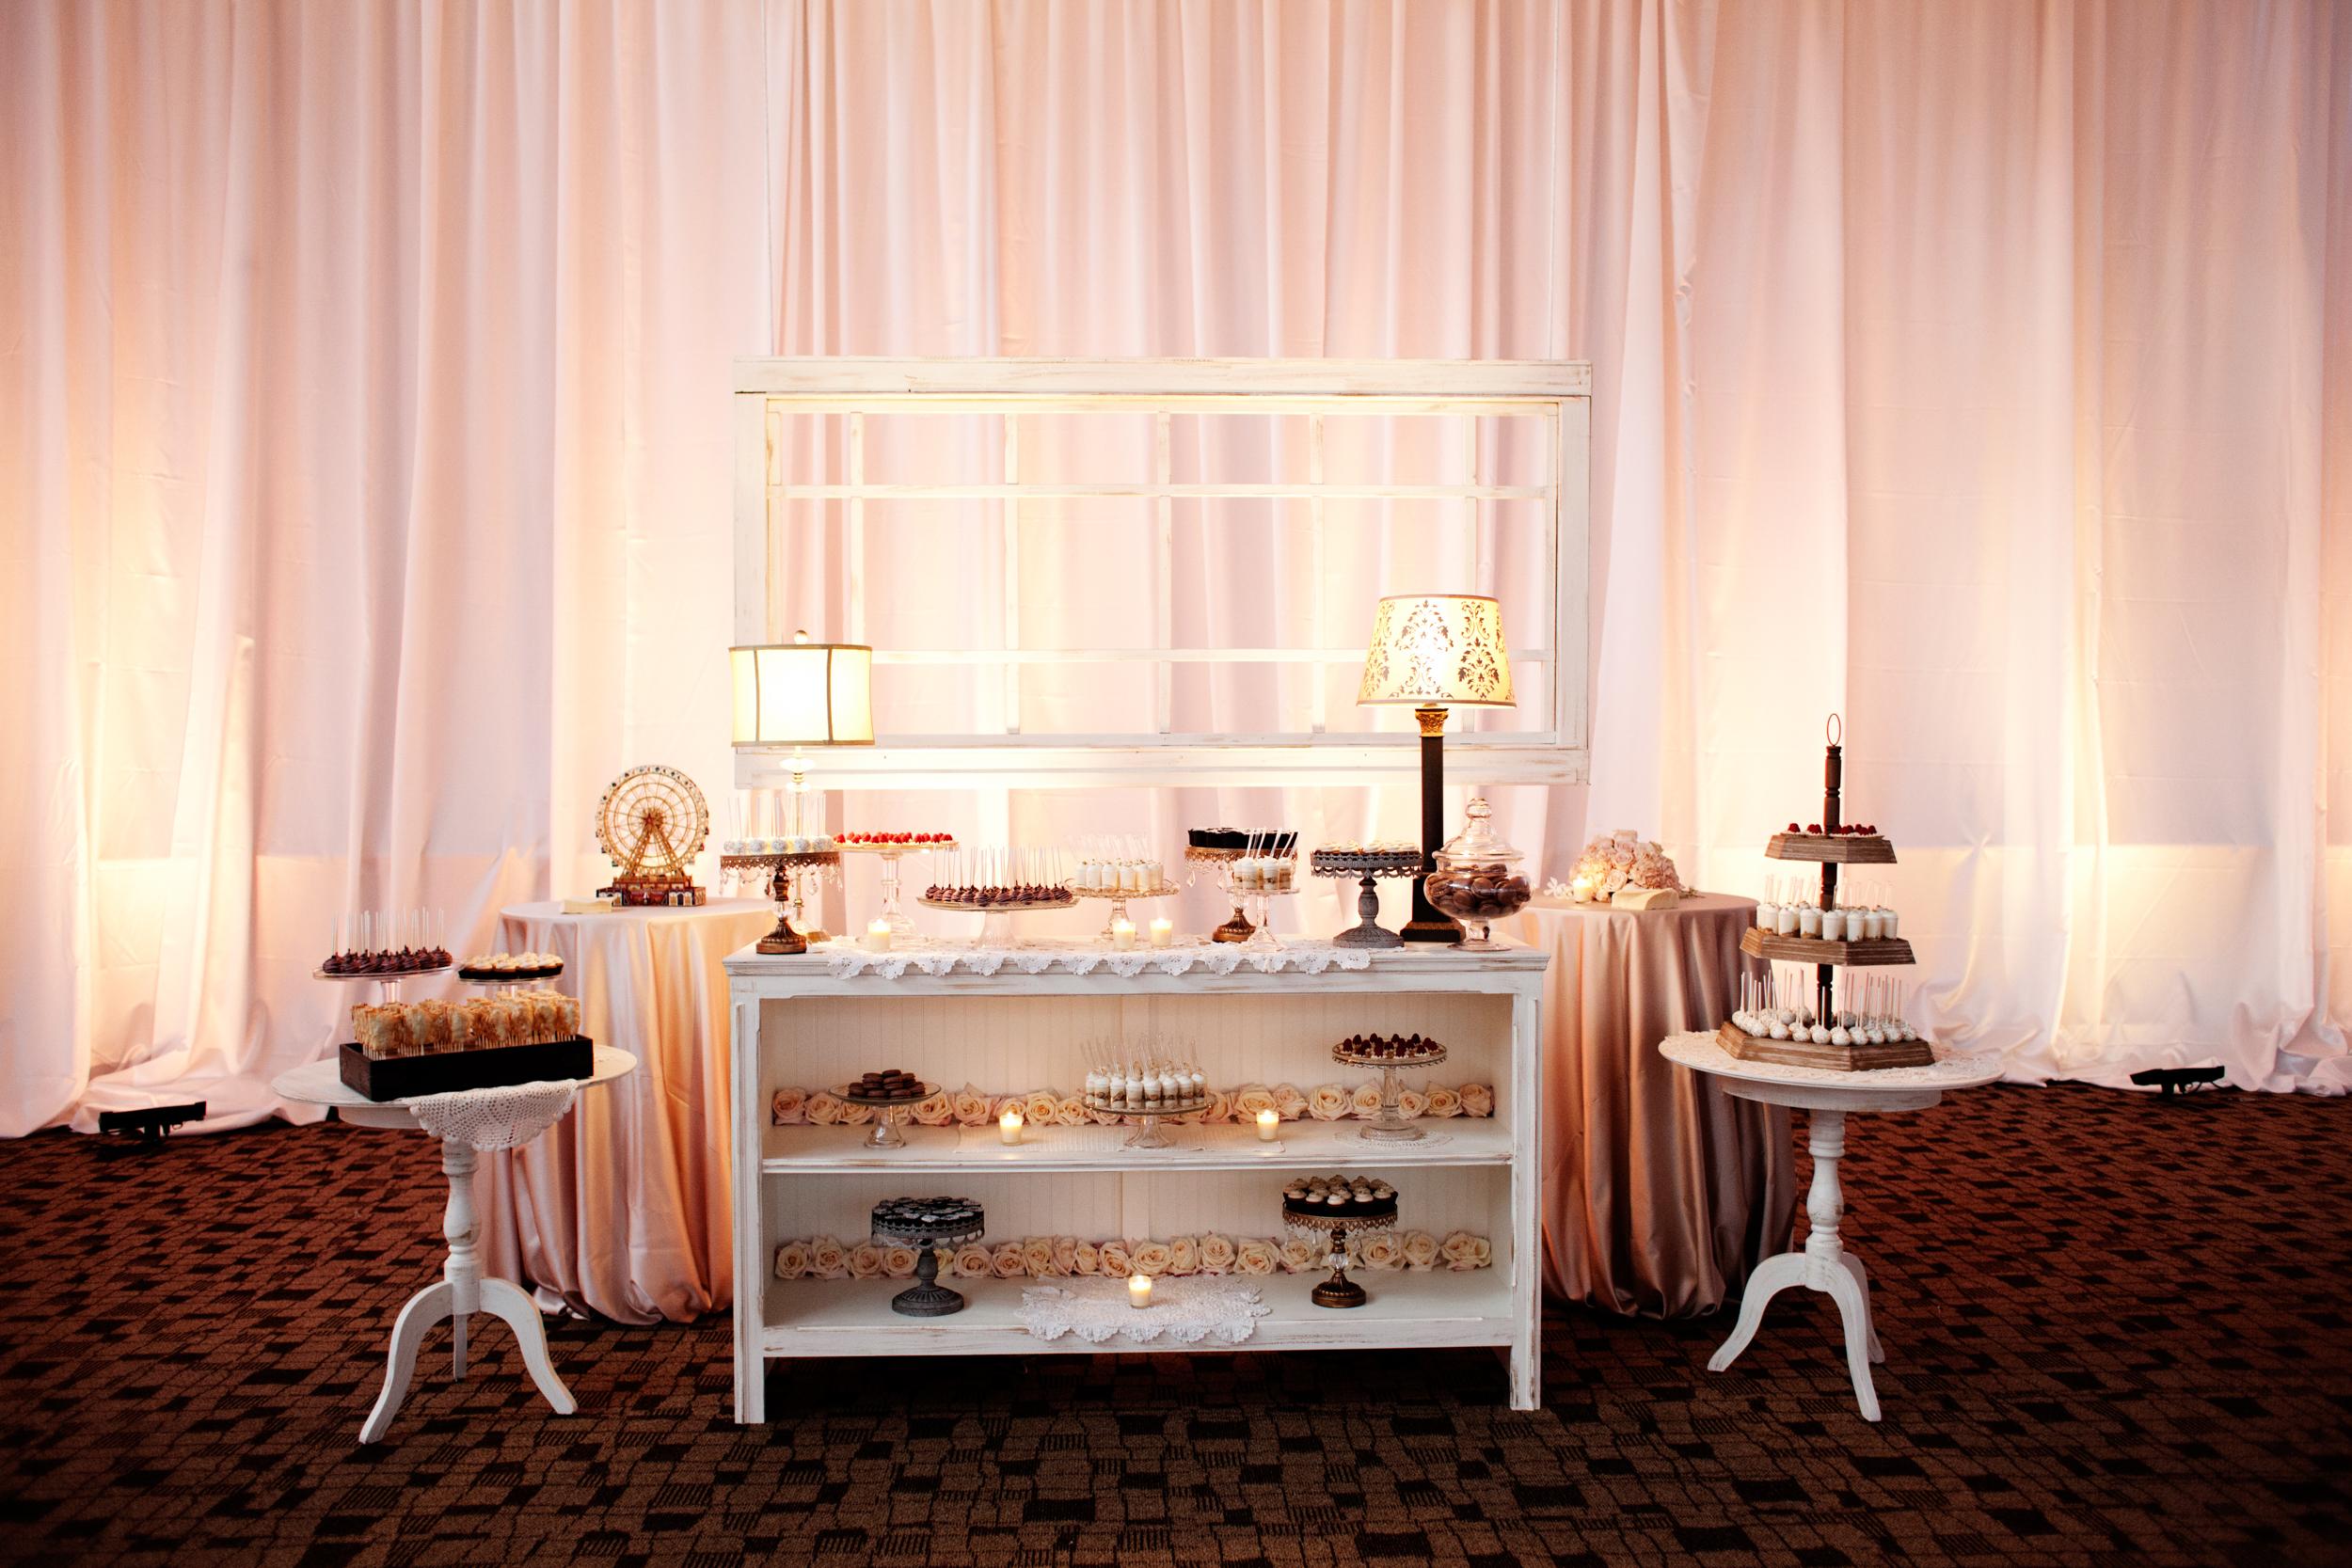 Ceci_New_York_Ceci_Style_Ceci_Johnson_Luxury_Lifestyle_Floral_Lace_Wedding_Letterpress_Inspiration_Design_Custom_Couture_Personalized_Invitations_-67.jpg